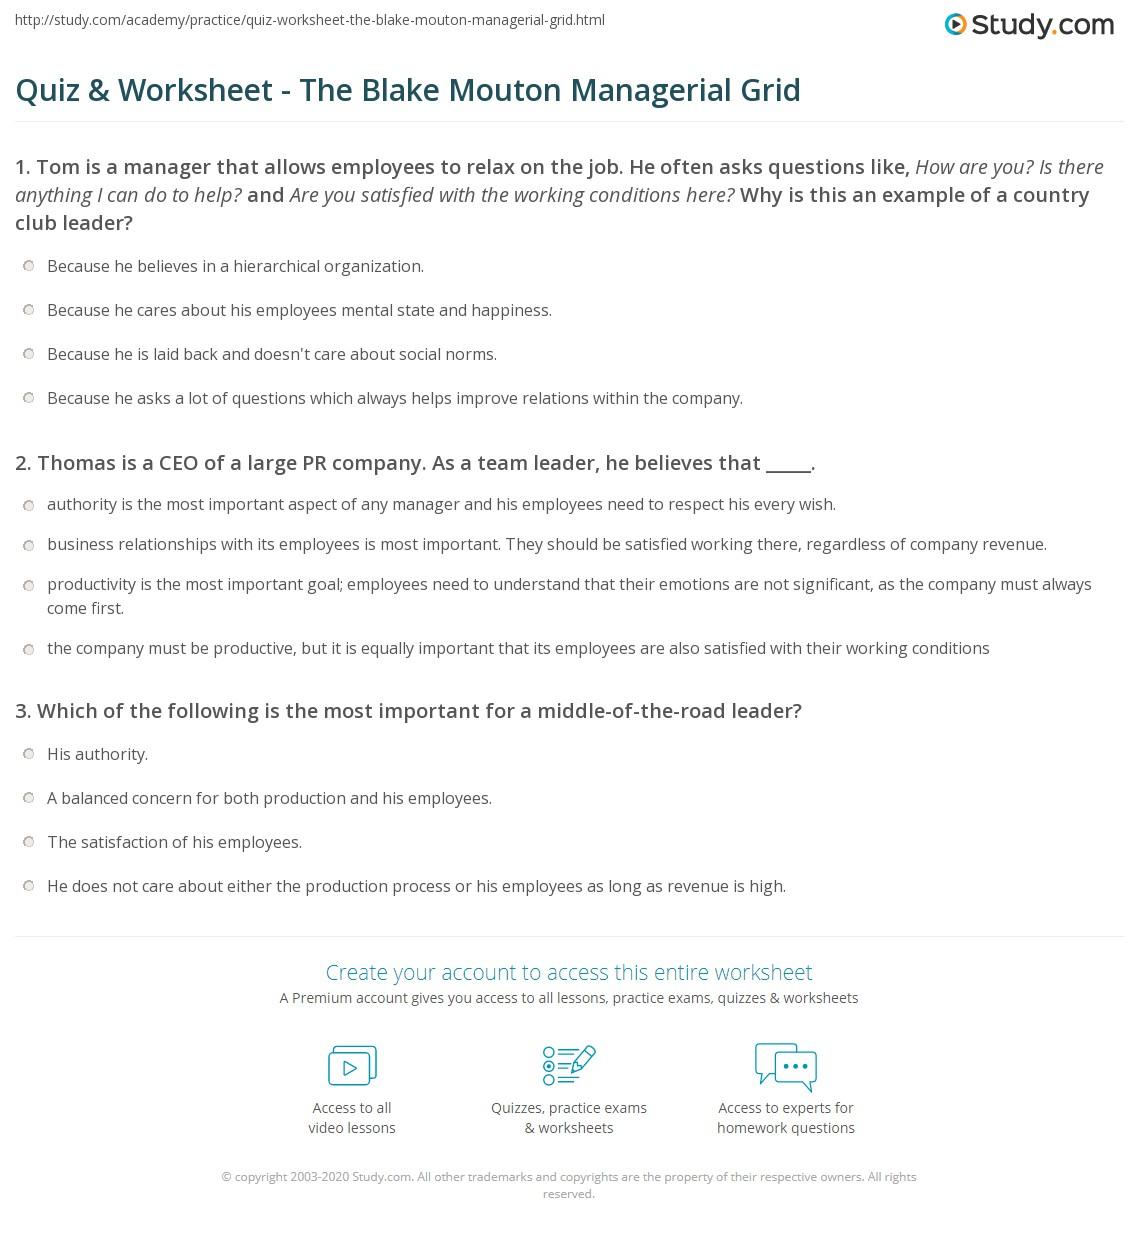 quiz worksheet the blake mouton managerial grid study com print the blake mouton managerial grid five leadership styles worksheet